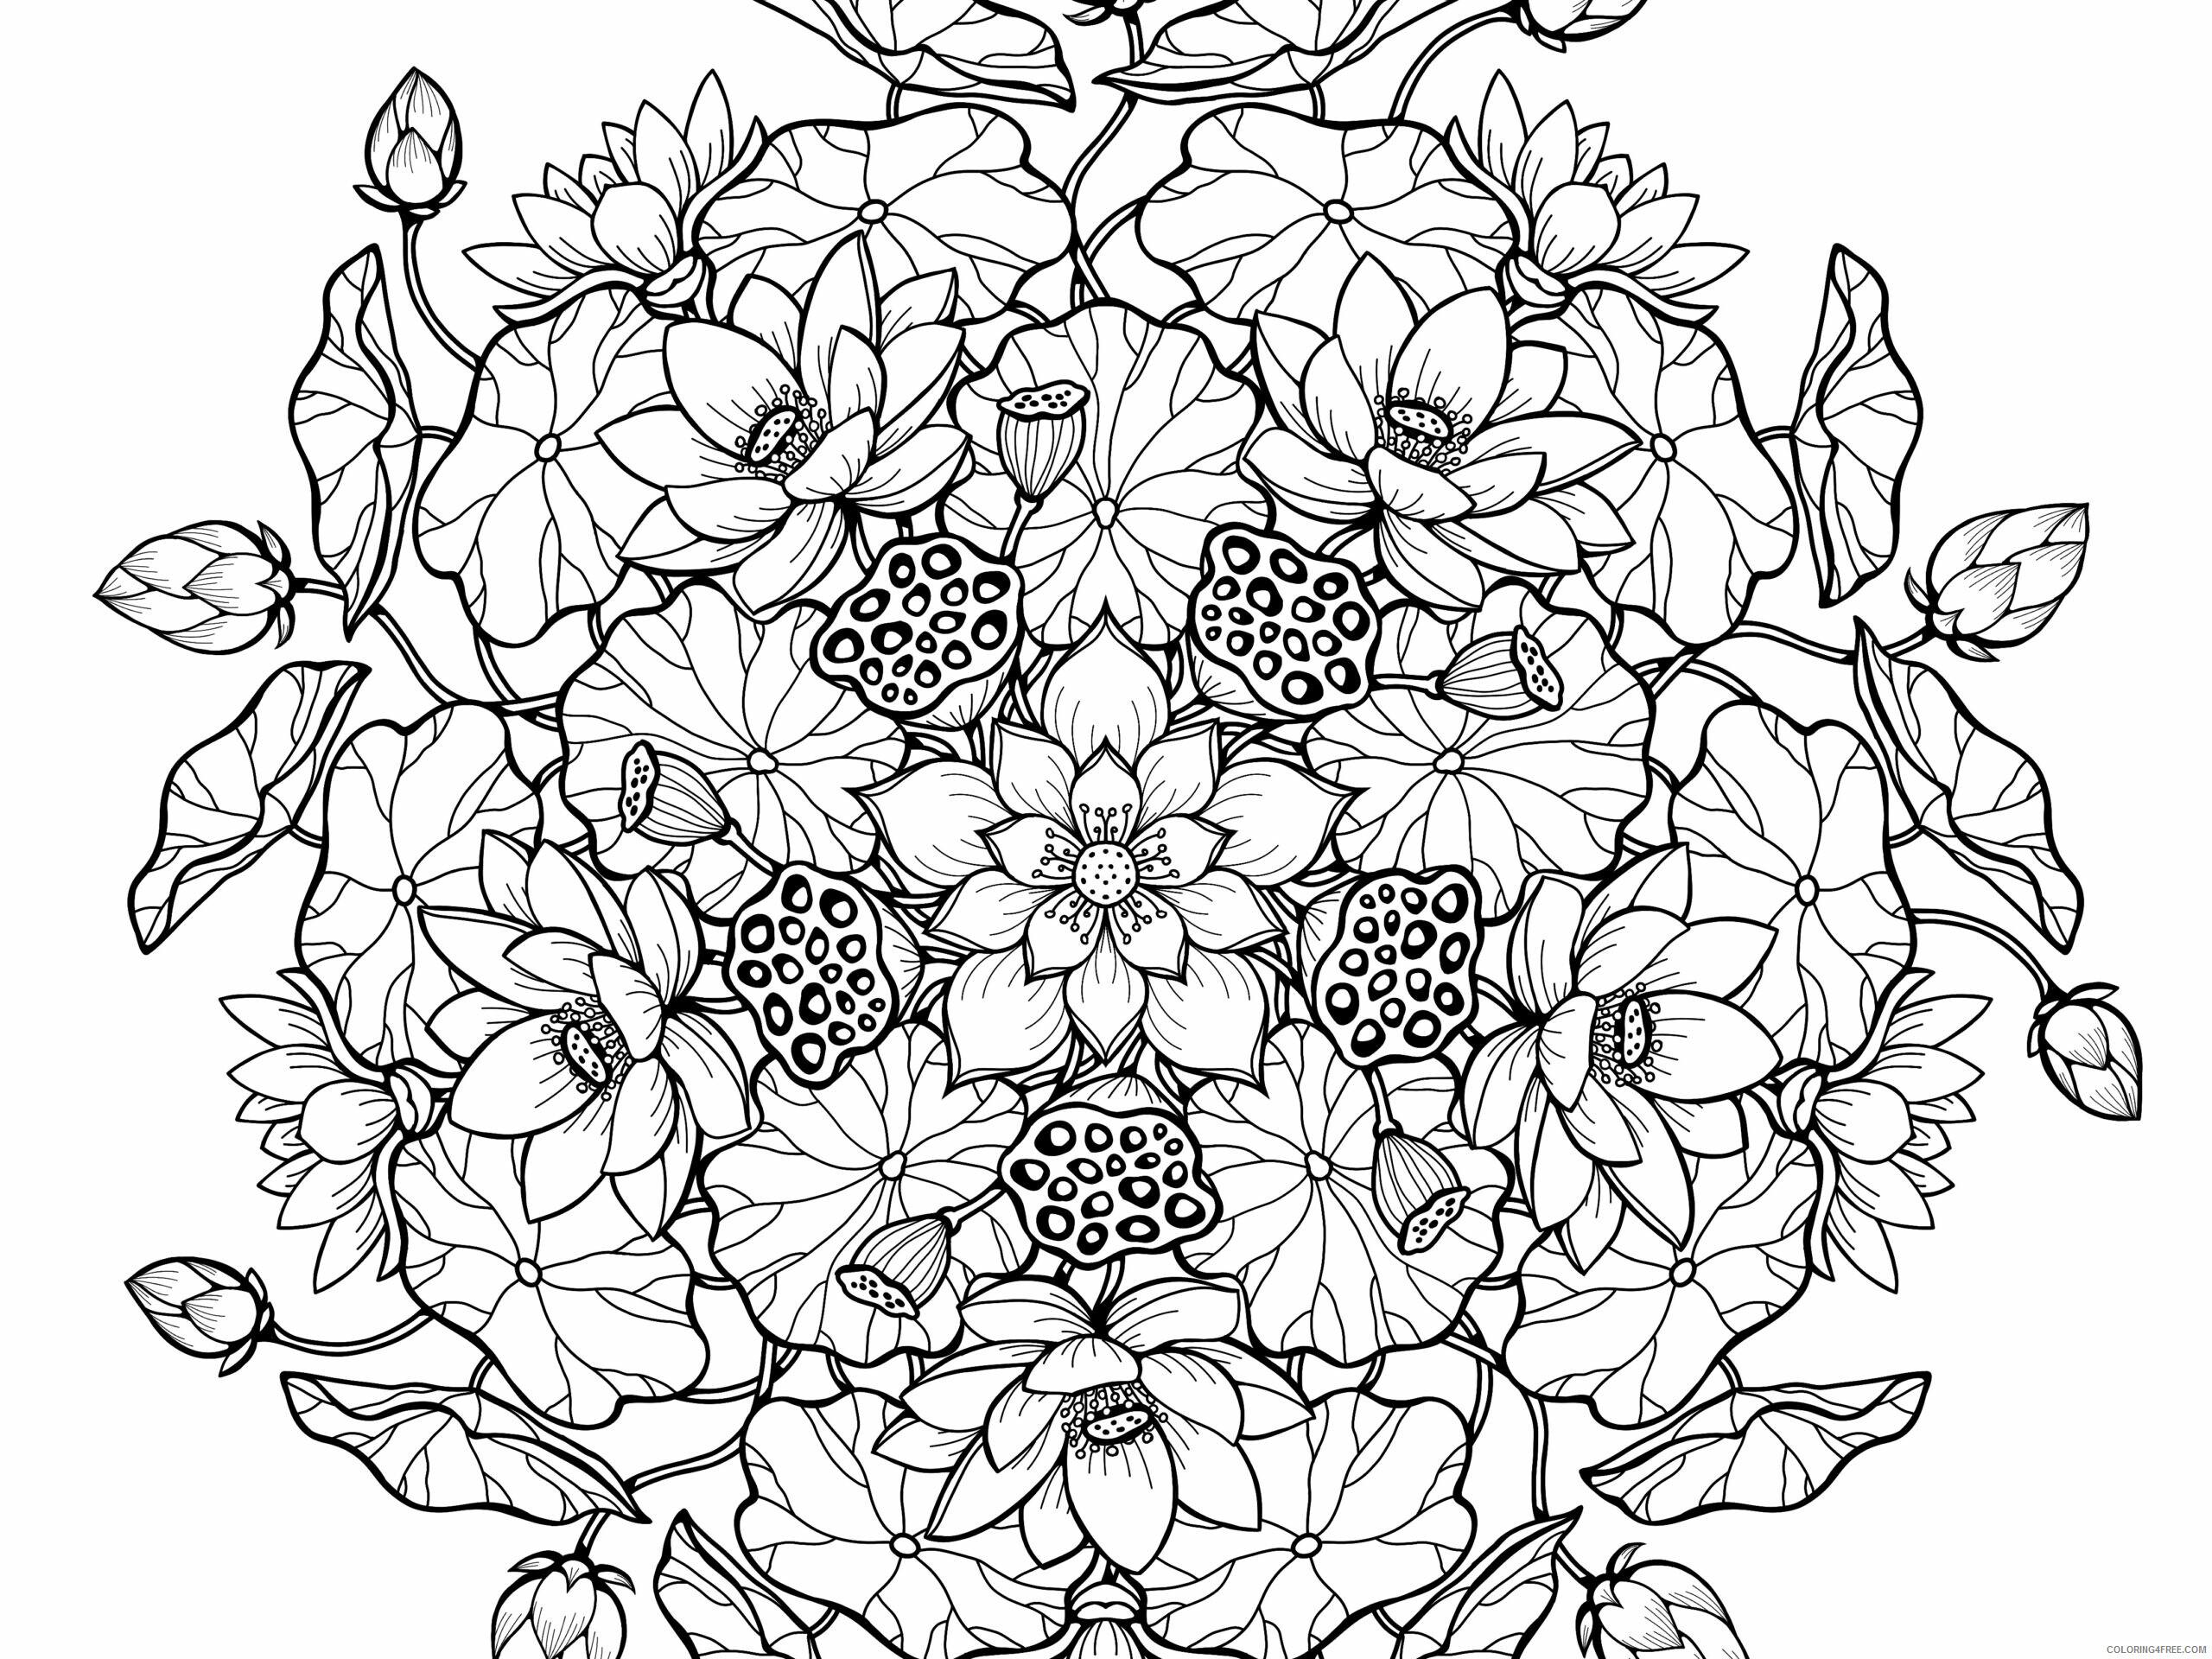 Mandala Coloring Pages Adult Mandala Floral For Adults Printable 2020 616 Coloring4free